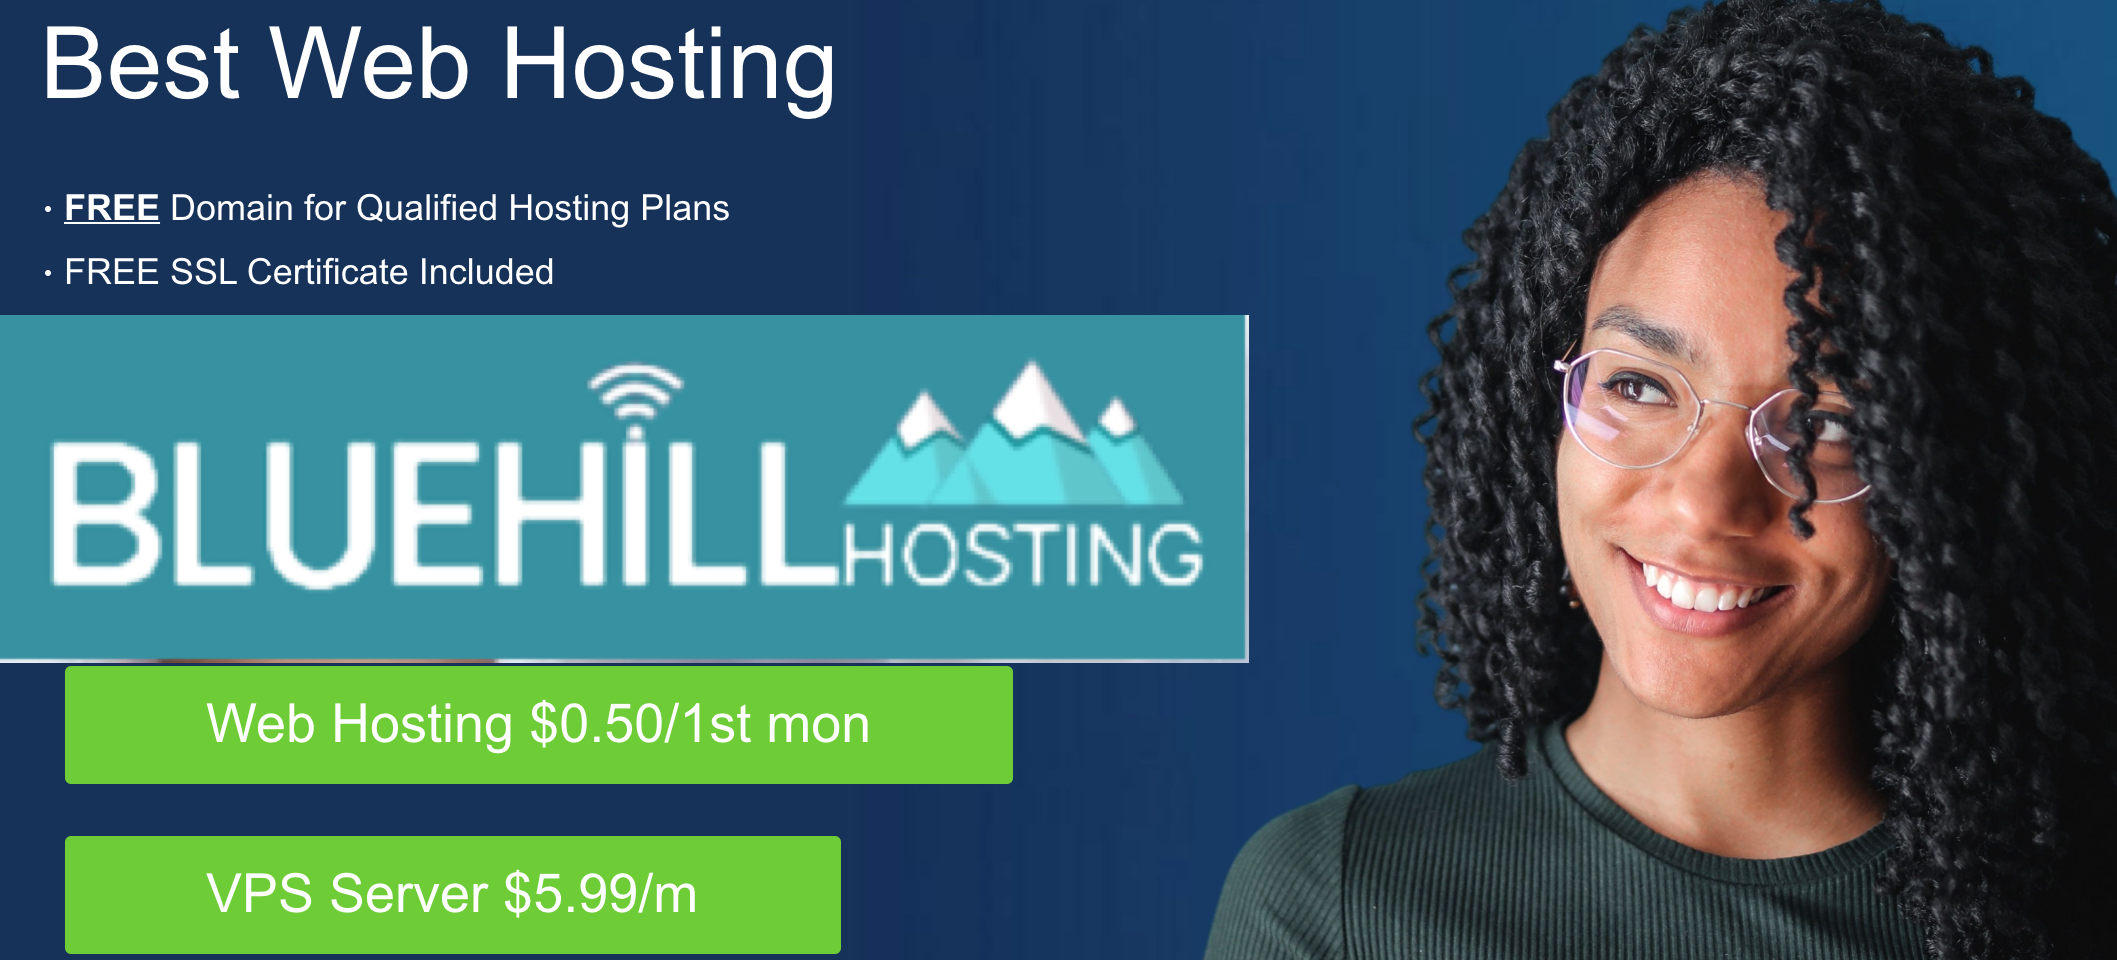 BEST WordPress Web Hosting Blue, Best WordPress Web Hosting Blue, Low Price Domains, WordPress Secure Hosting, website services, hosting blue, blue web hosting, ultimate web hosting linux, ultimate linux hosting